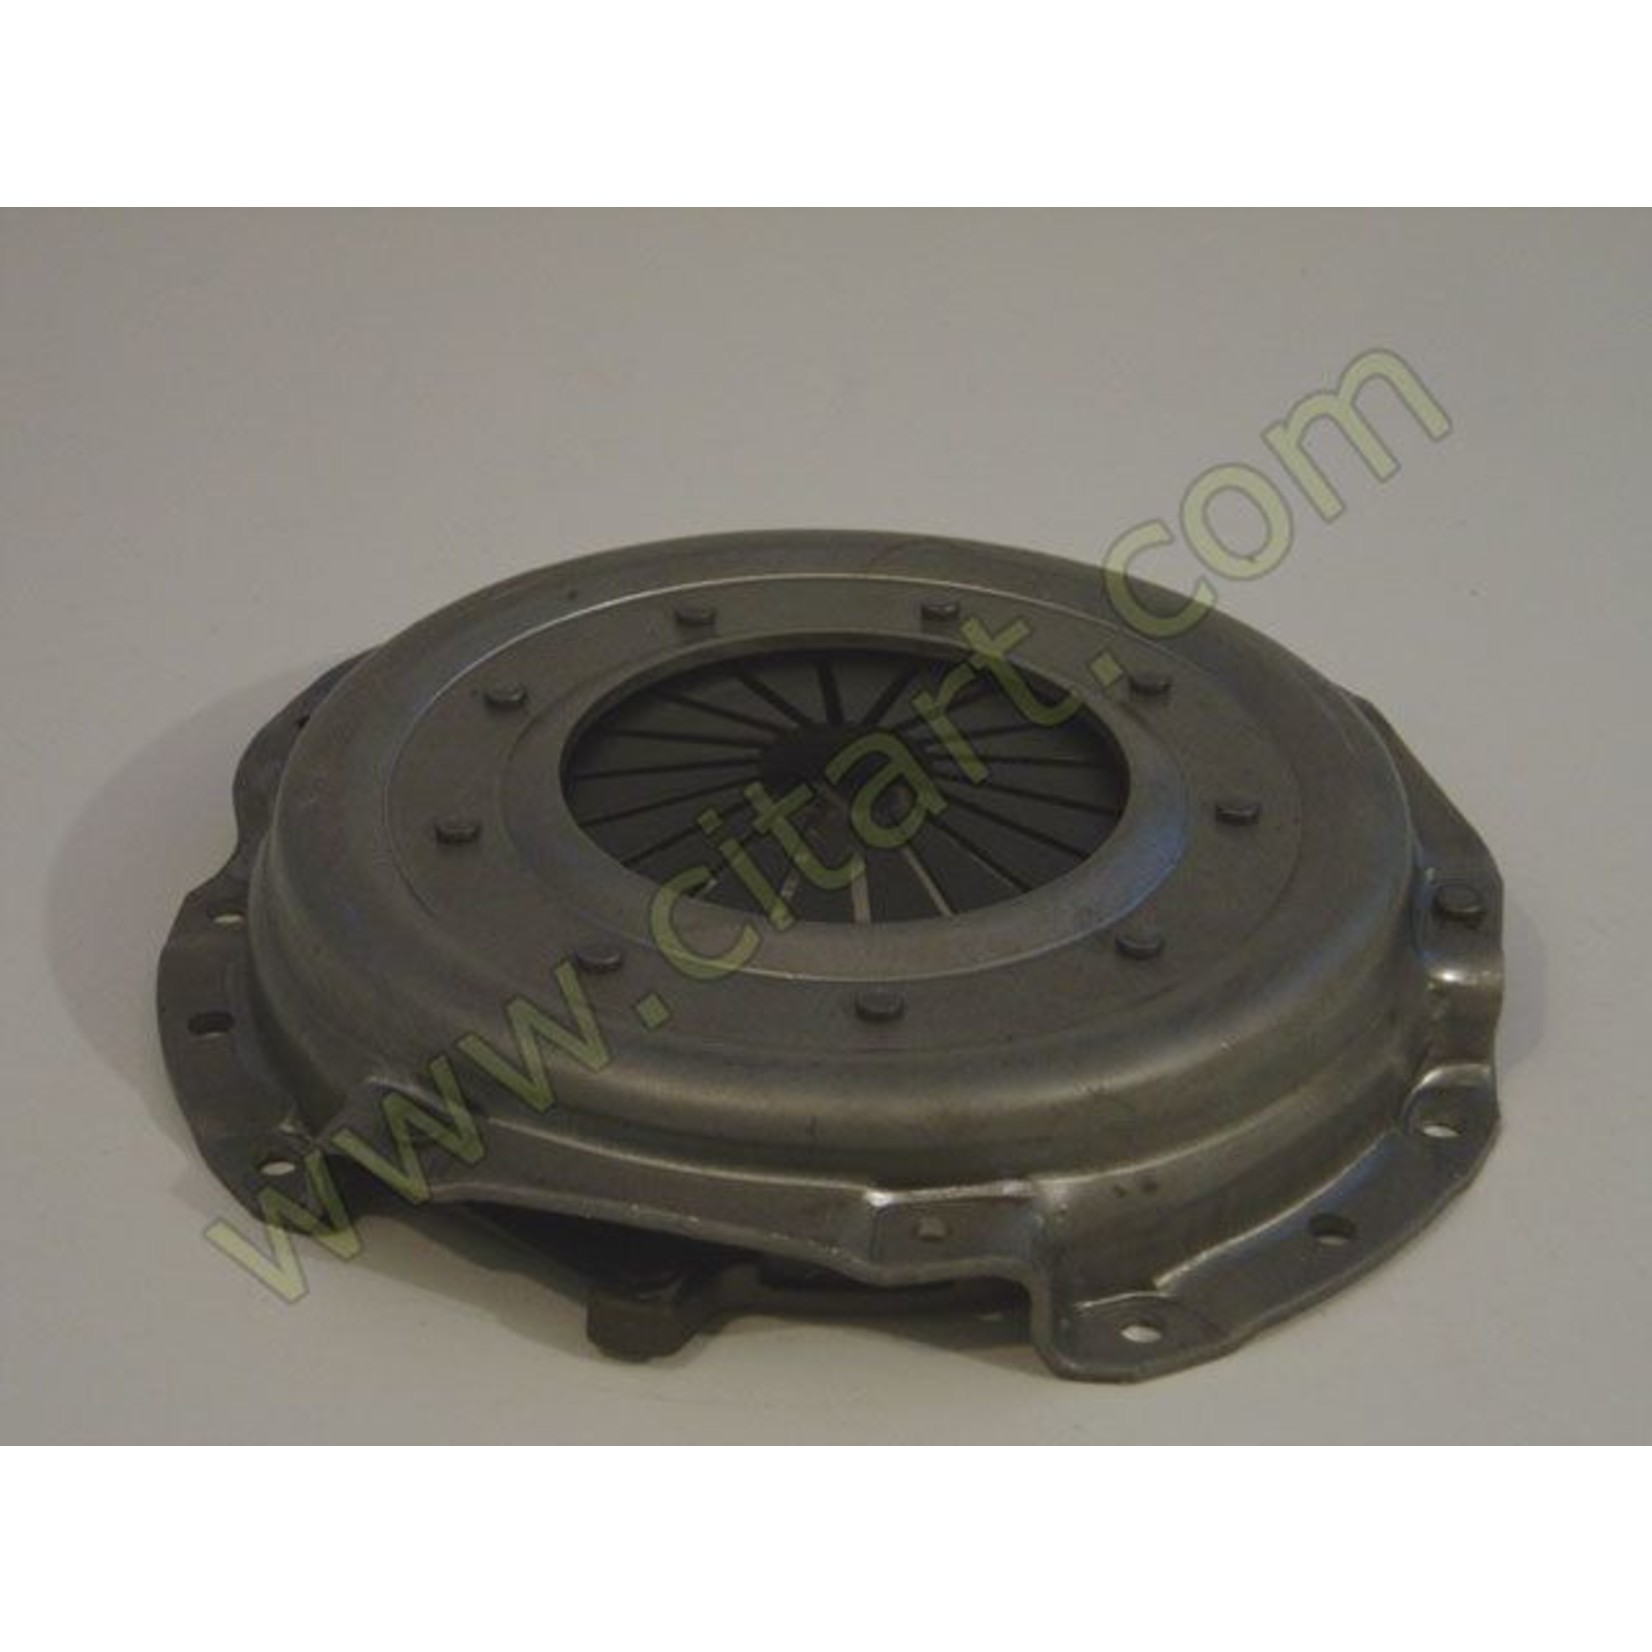 Clutch mechanism driving plate Nr Org: 5432501